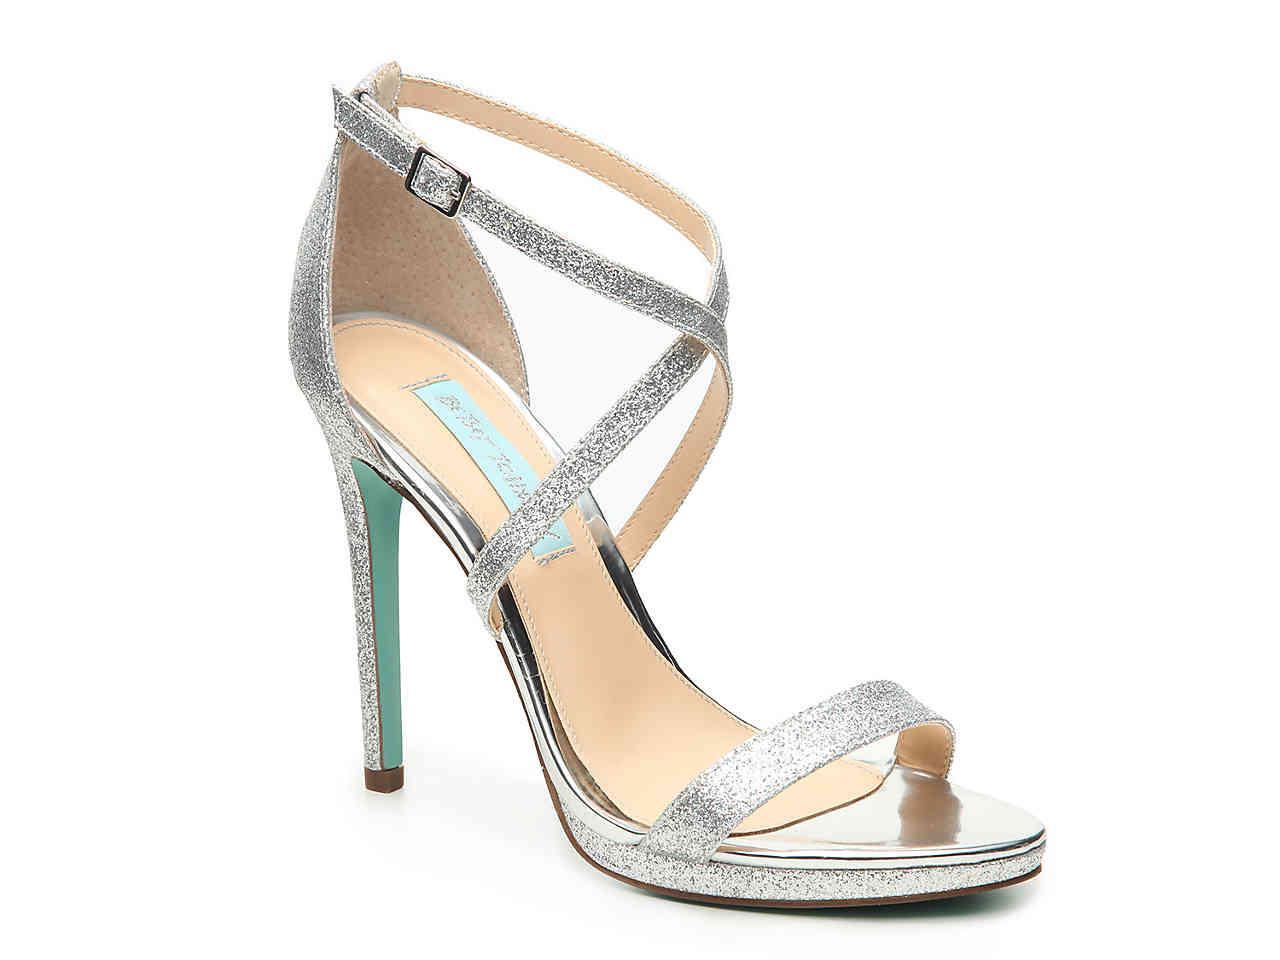 e562d69da83 Lyst - Betsey Johnson Dina Platform Sandal in Metallic